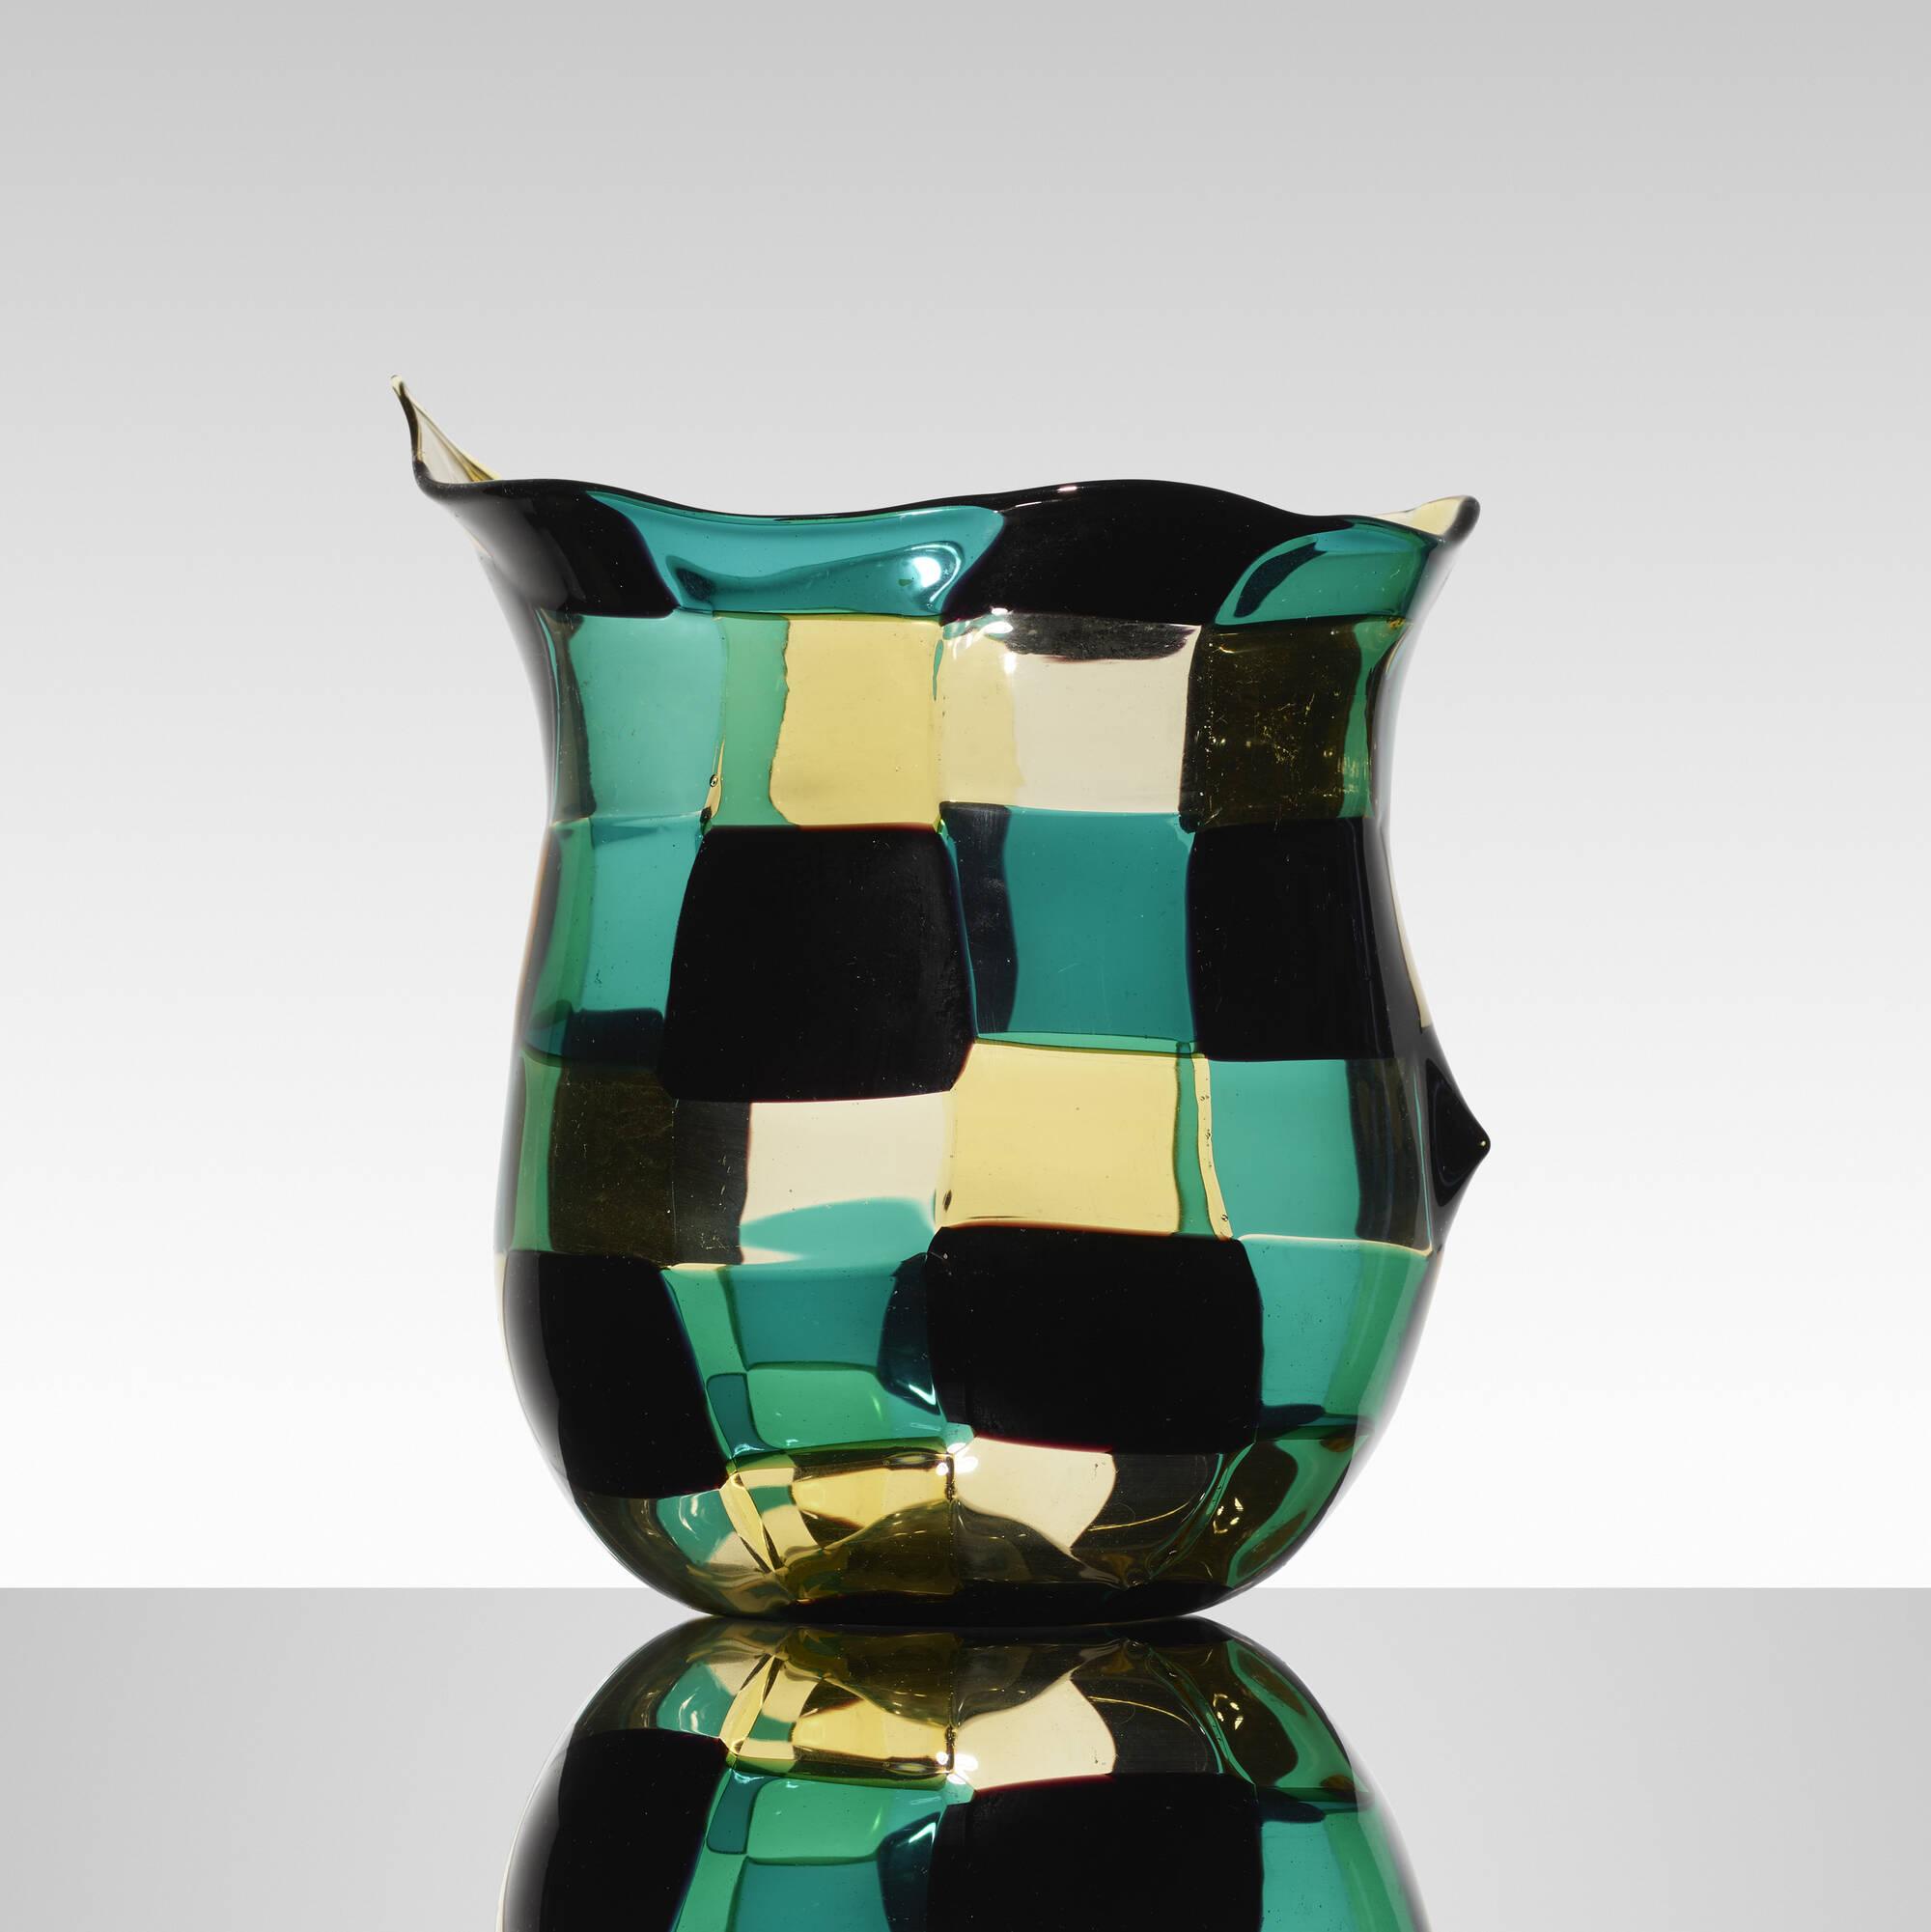 138: Fulvio Bianconi / Pezzato vase (1 of 3)